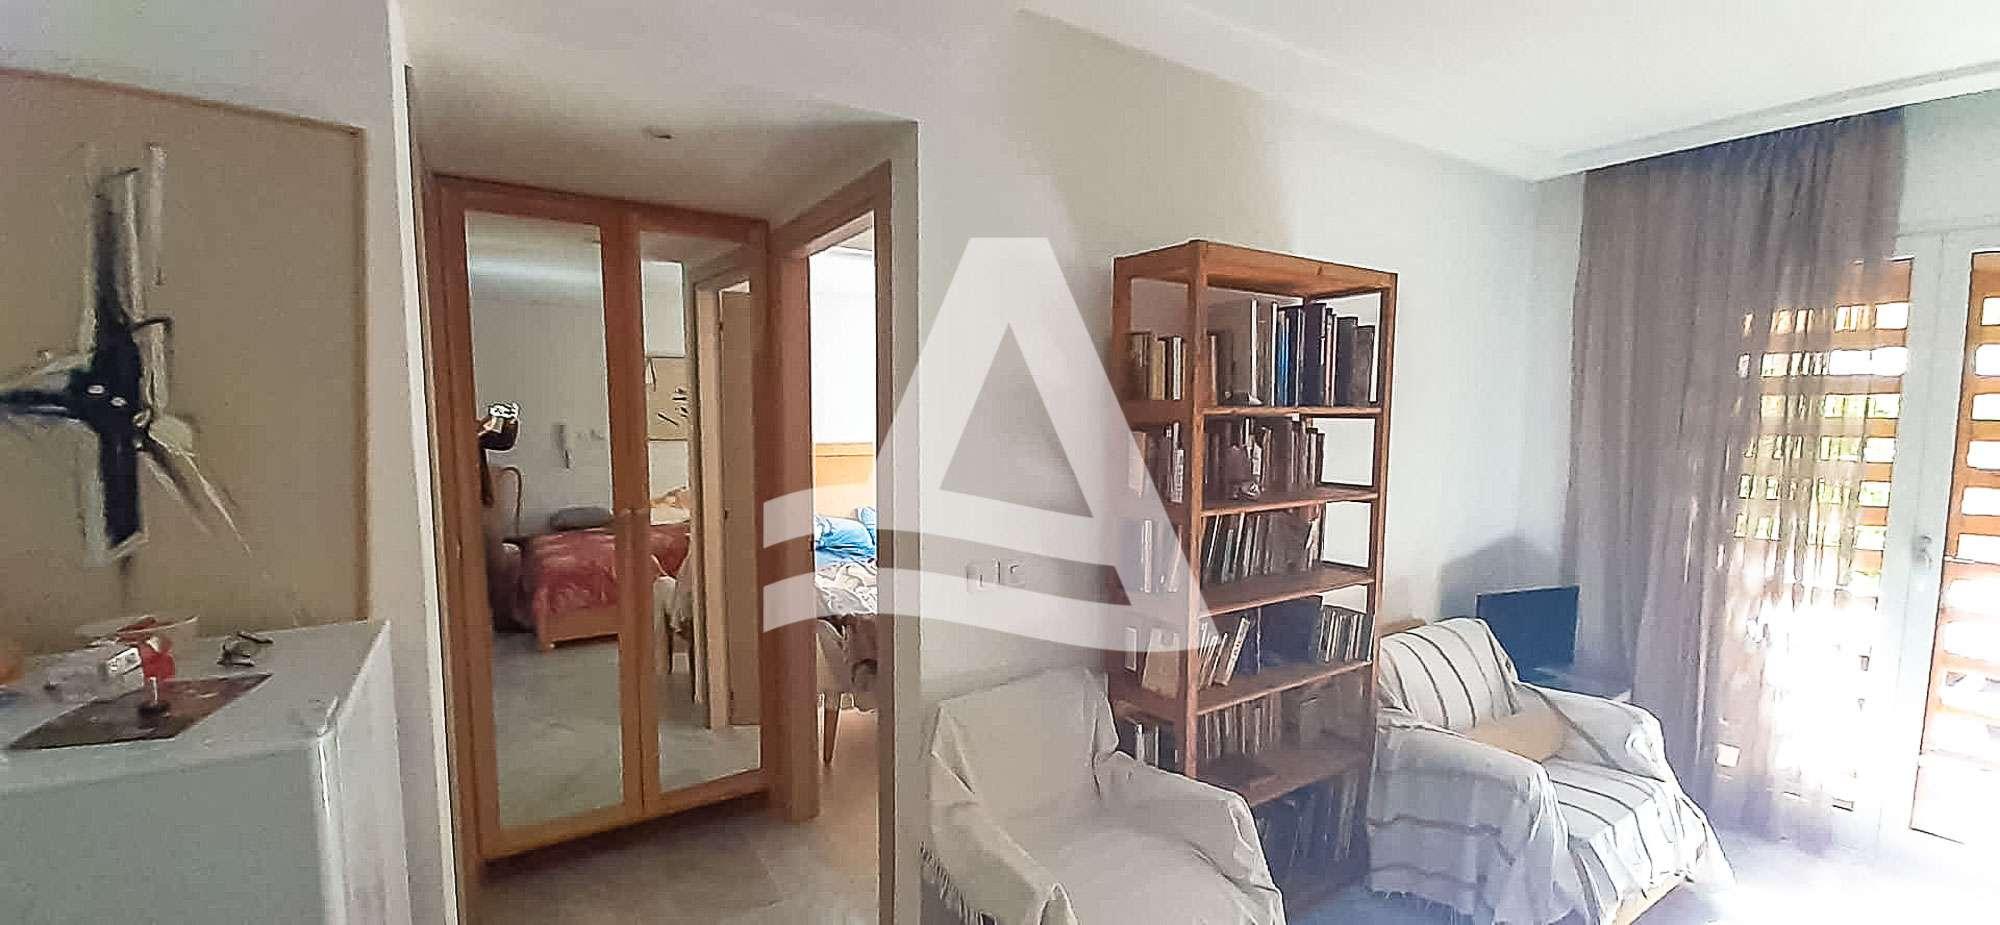 httpss3.amazonaws.comlogimoaws_Arcane_immobilière_la_Marsa-_location_-_vente_la_marsa_11_sur_12_1574441790517